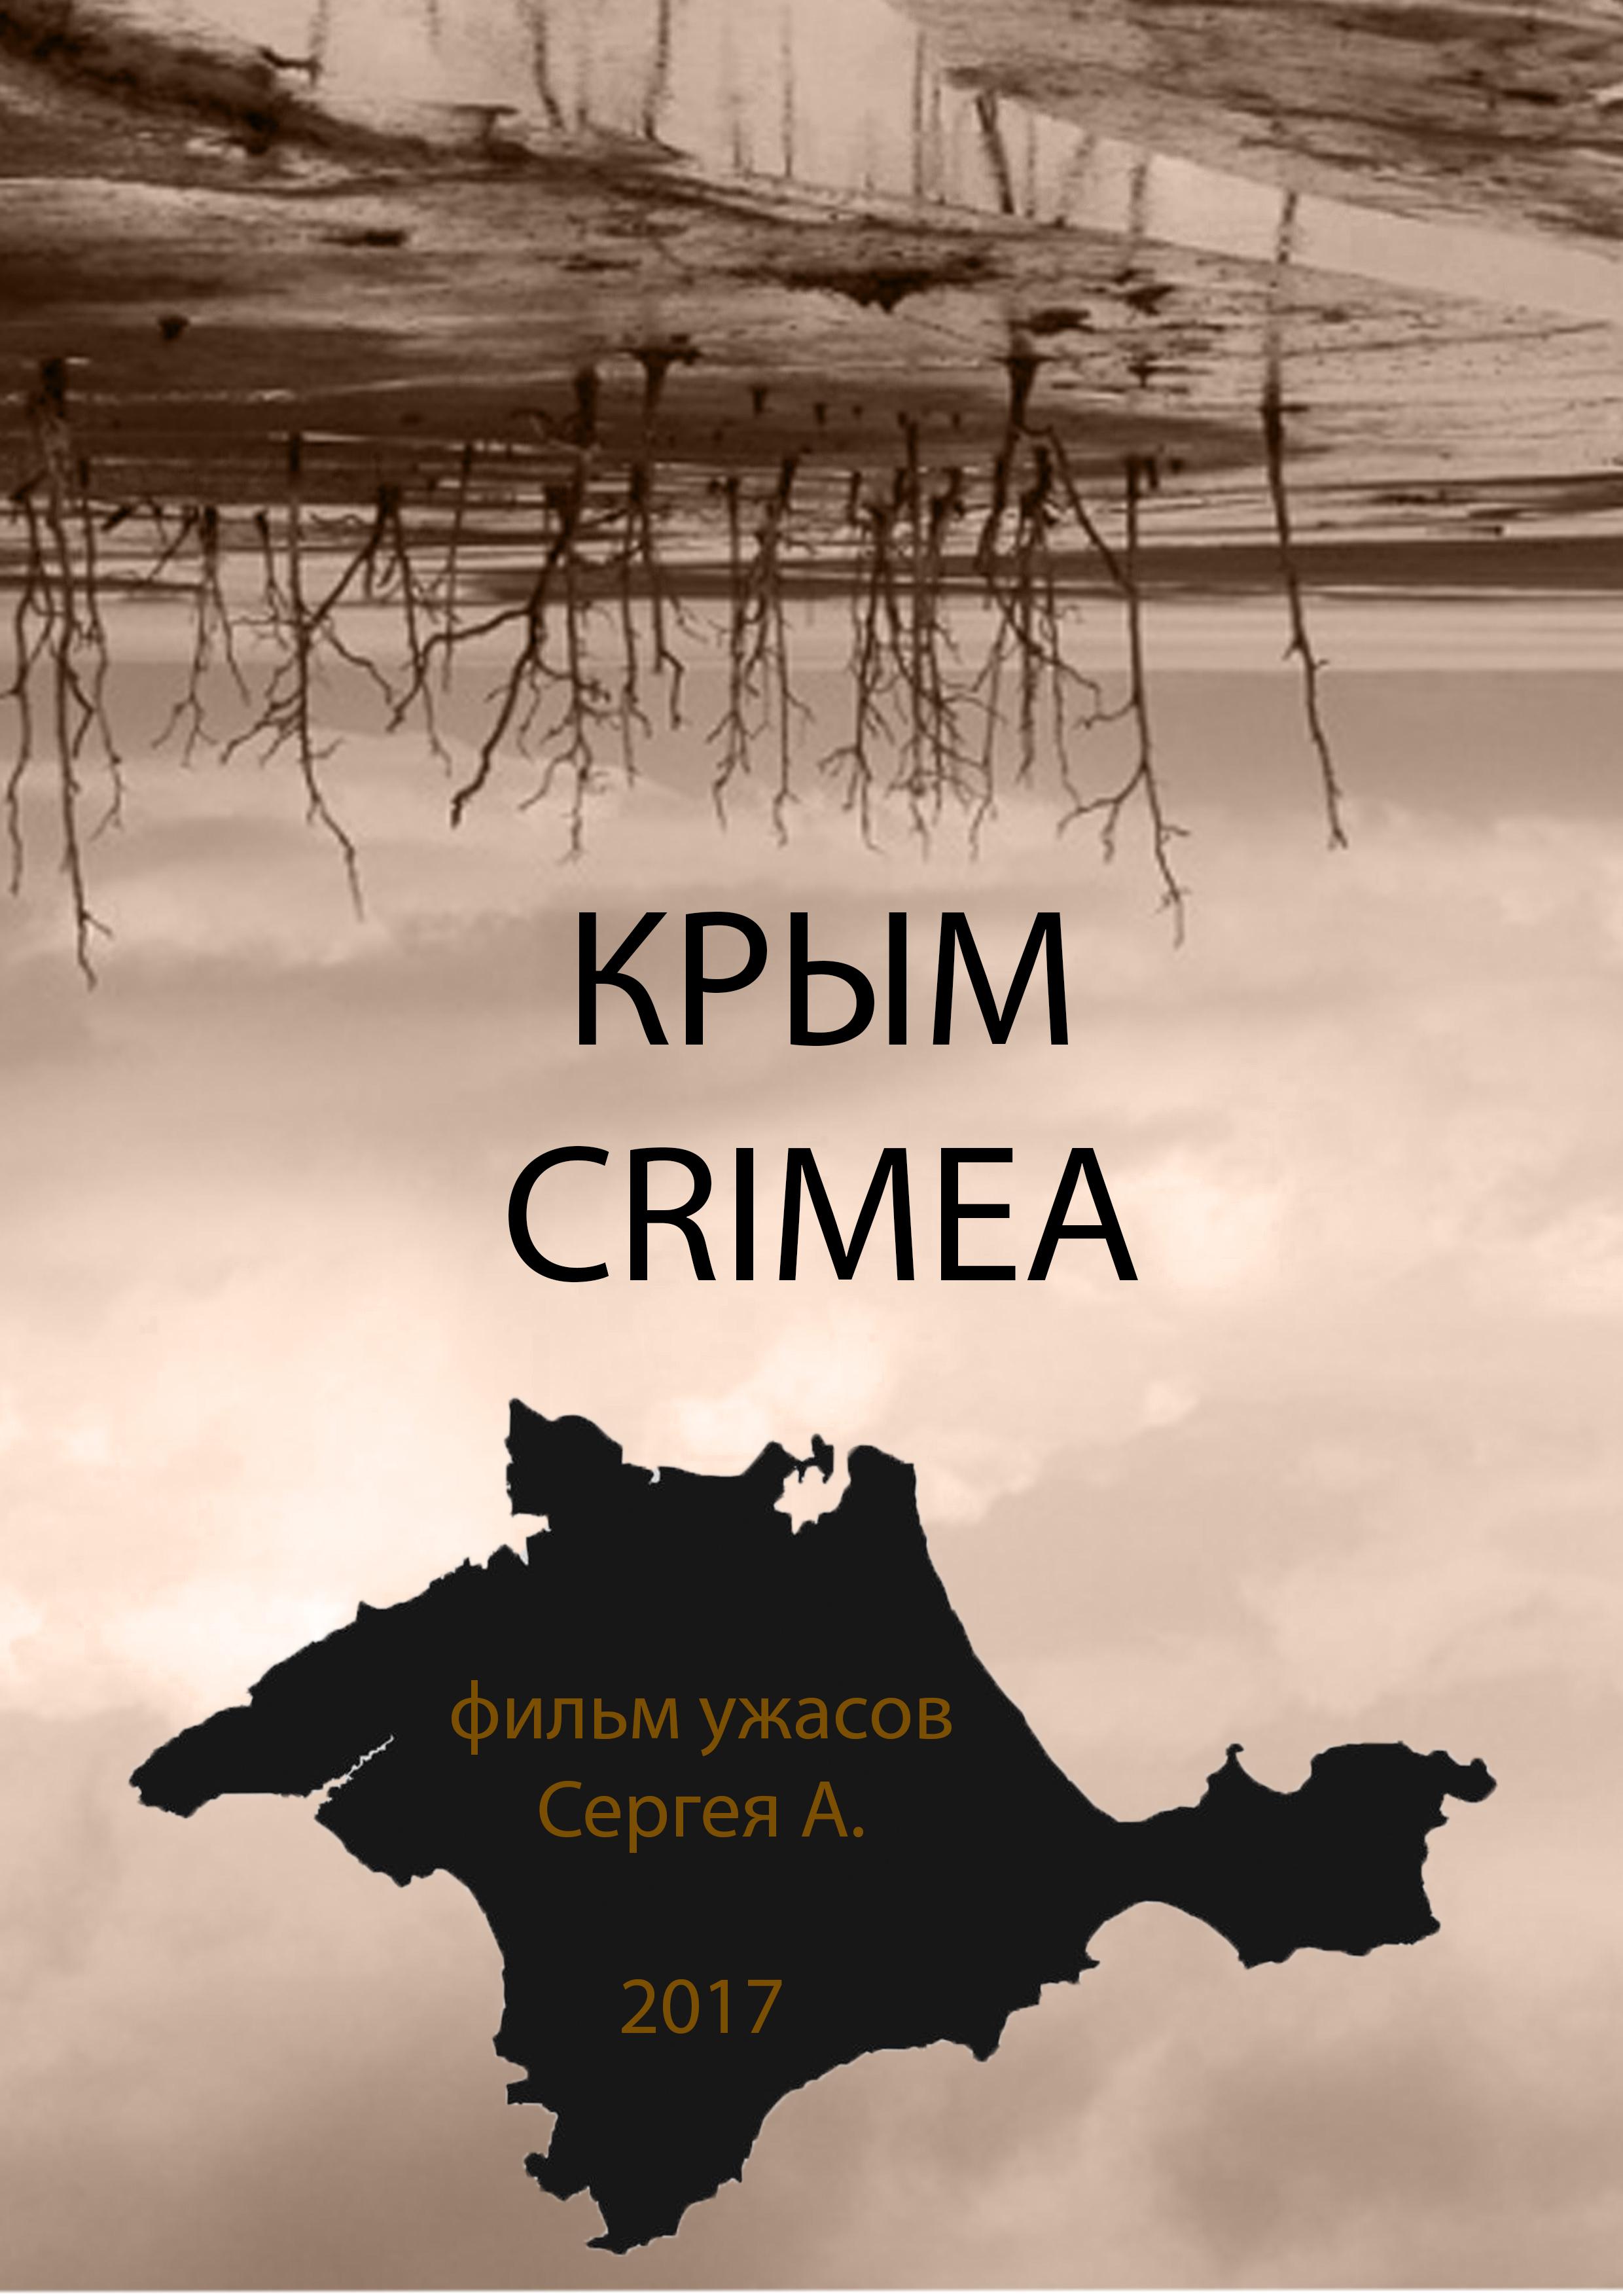 Krym 2017 Imdb